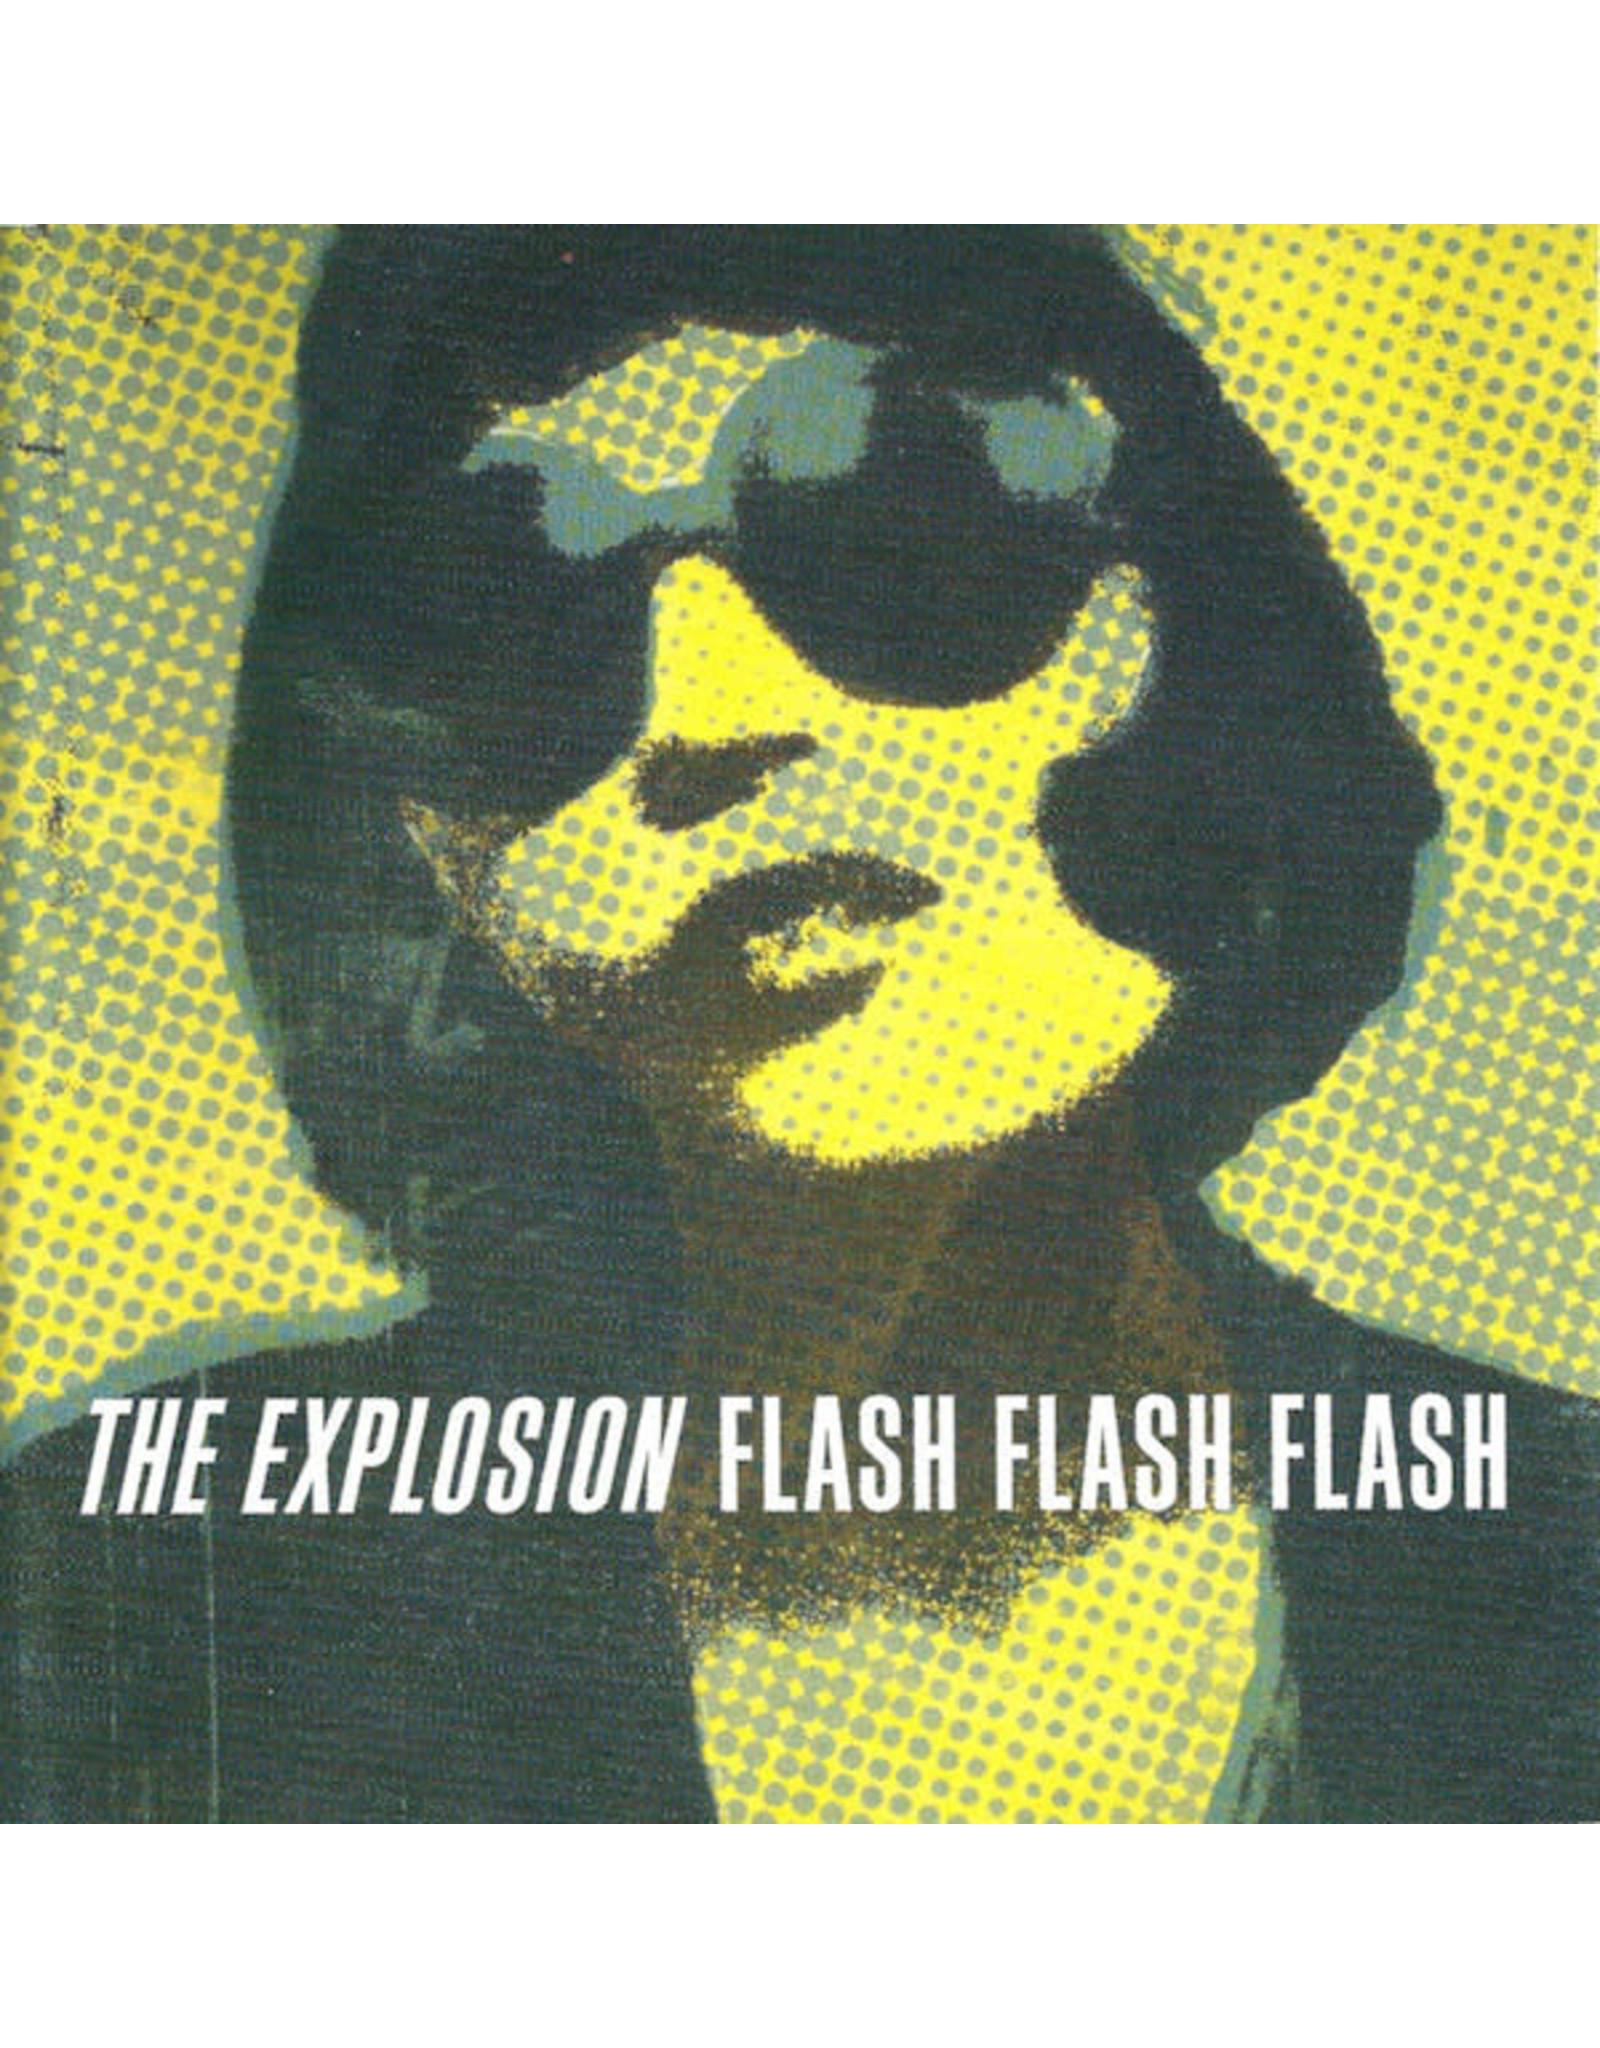 Explosion, The - Flash Flash Flash LP (clear)